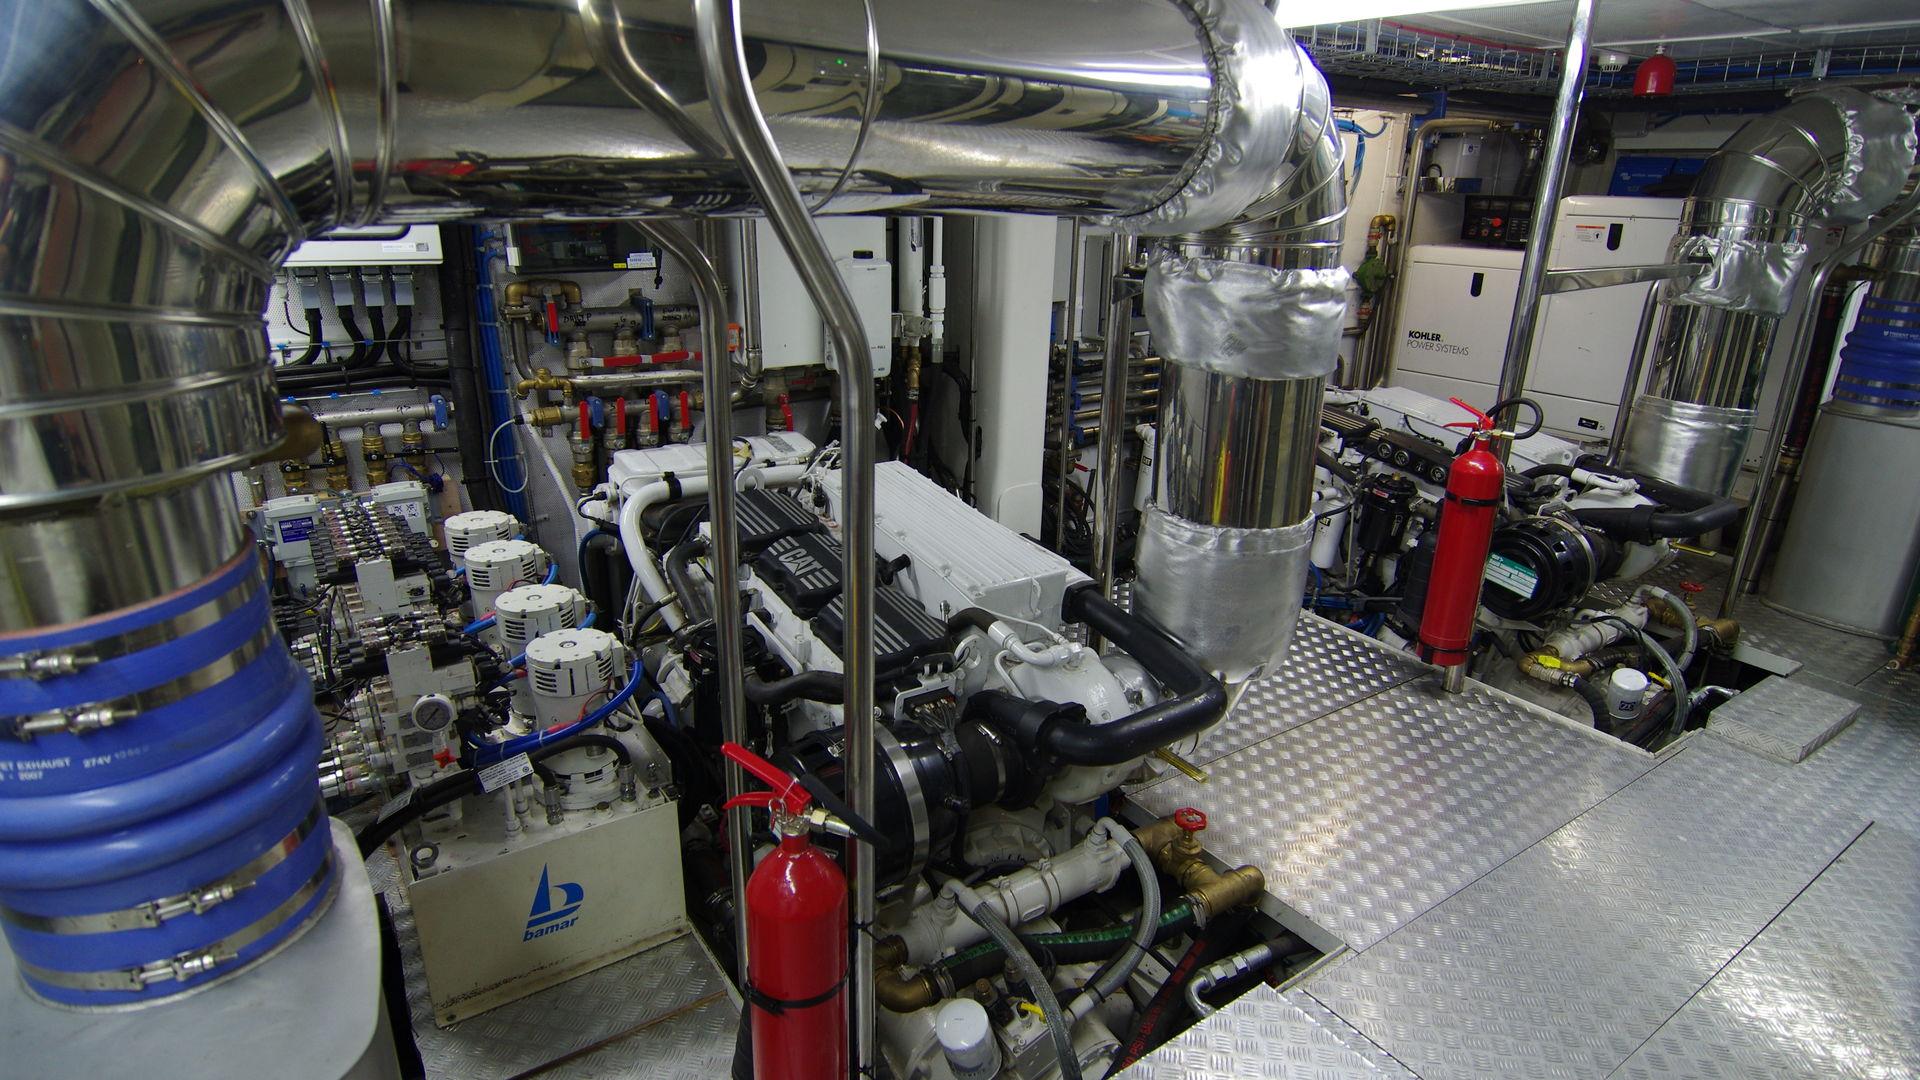 Renaissance engines